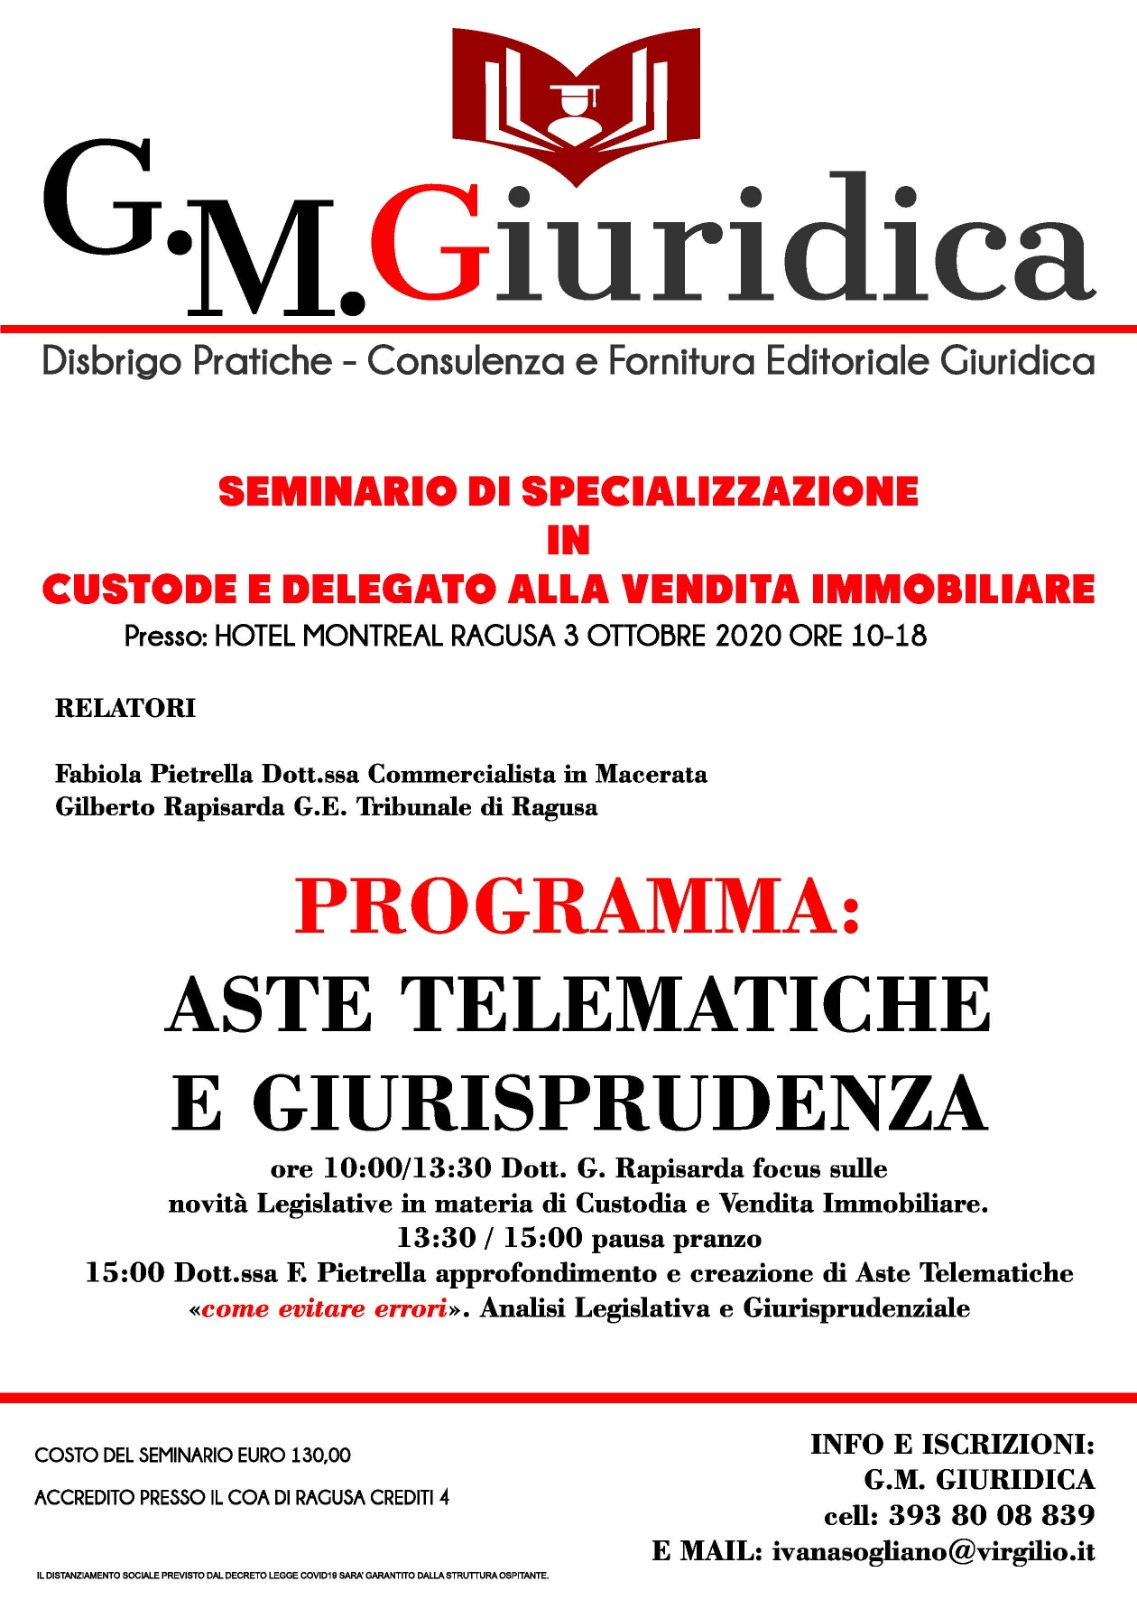 https://www.businessblog.it/wp-content/uploads/2020/09/aste-telematiche-e-giurisprudenza.jpeg